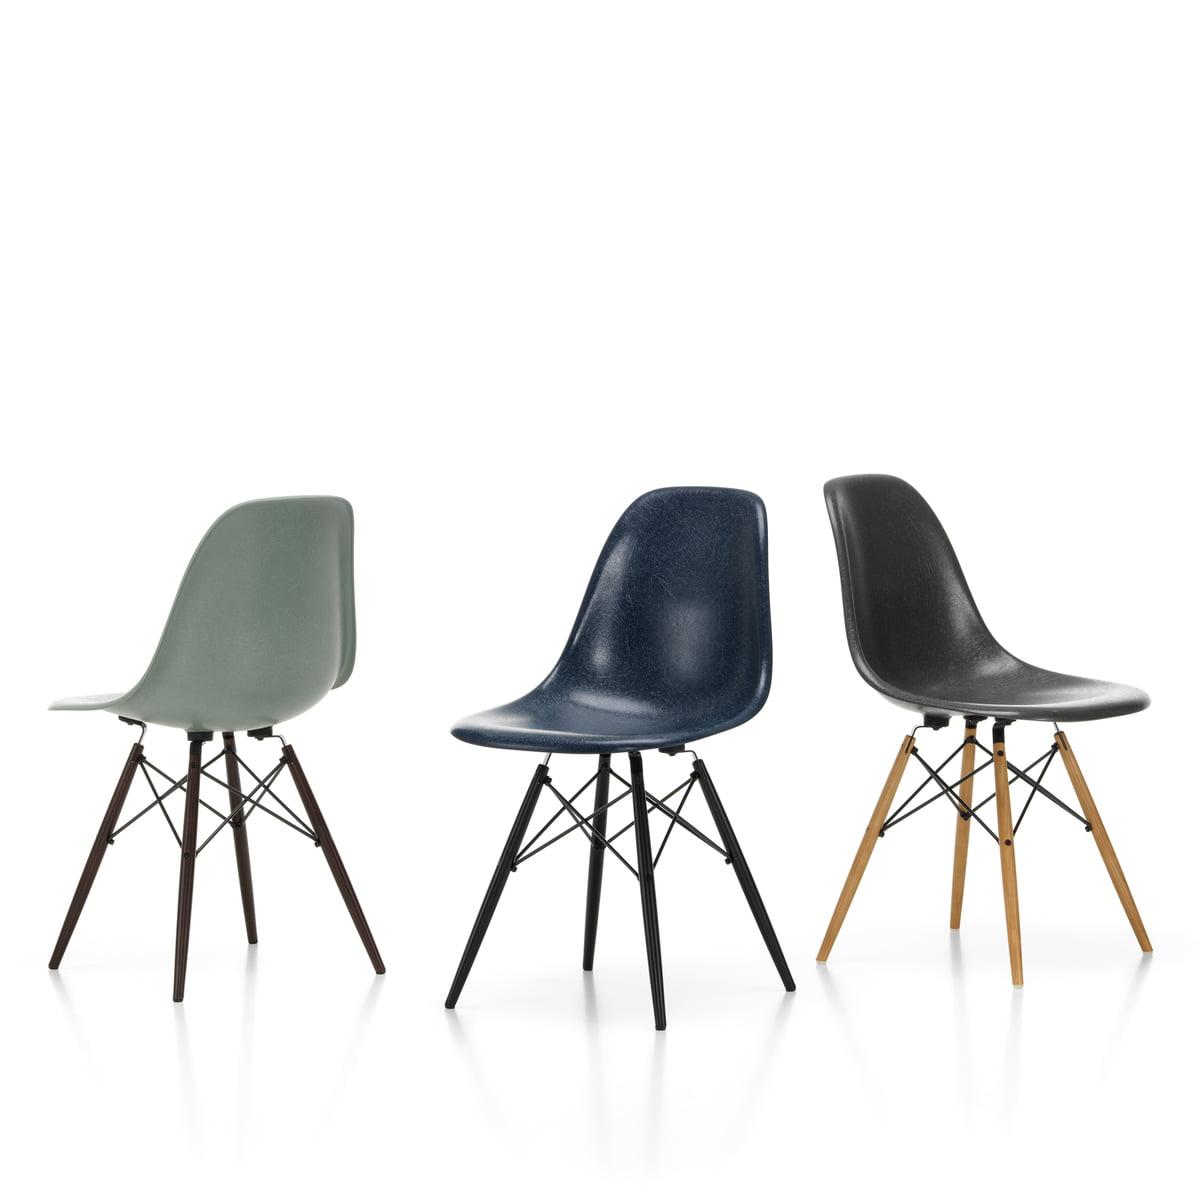 Chair Side VitraConnox Fiberglass Von Eames Dsw 67vgfybY